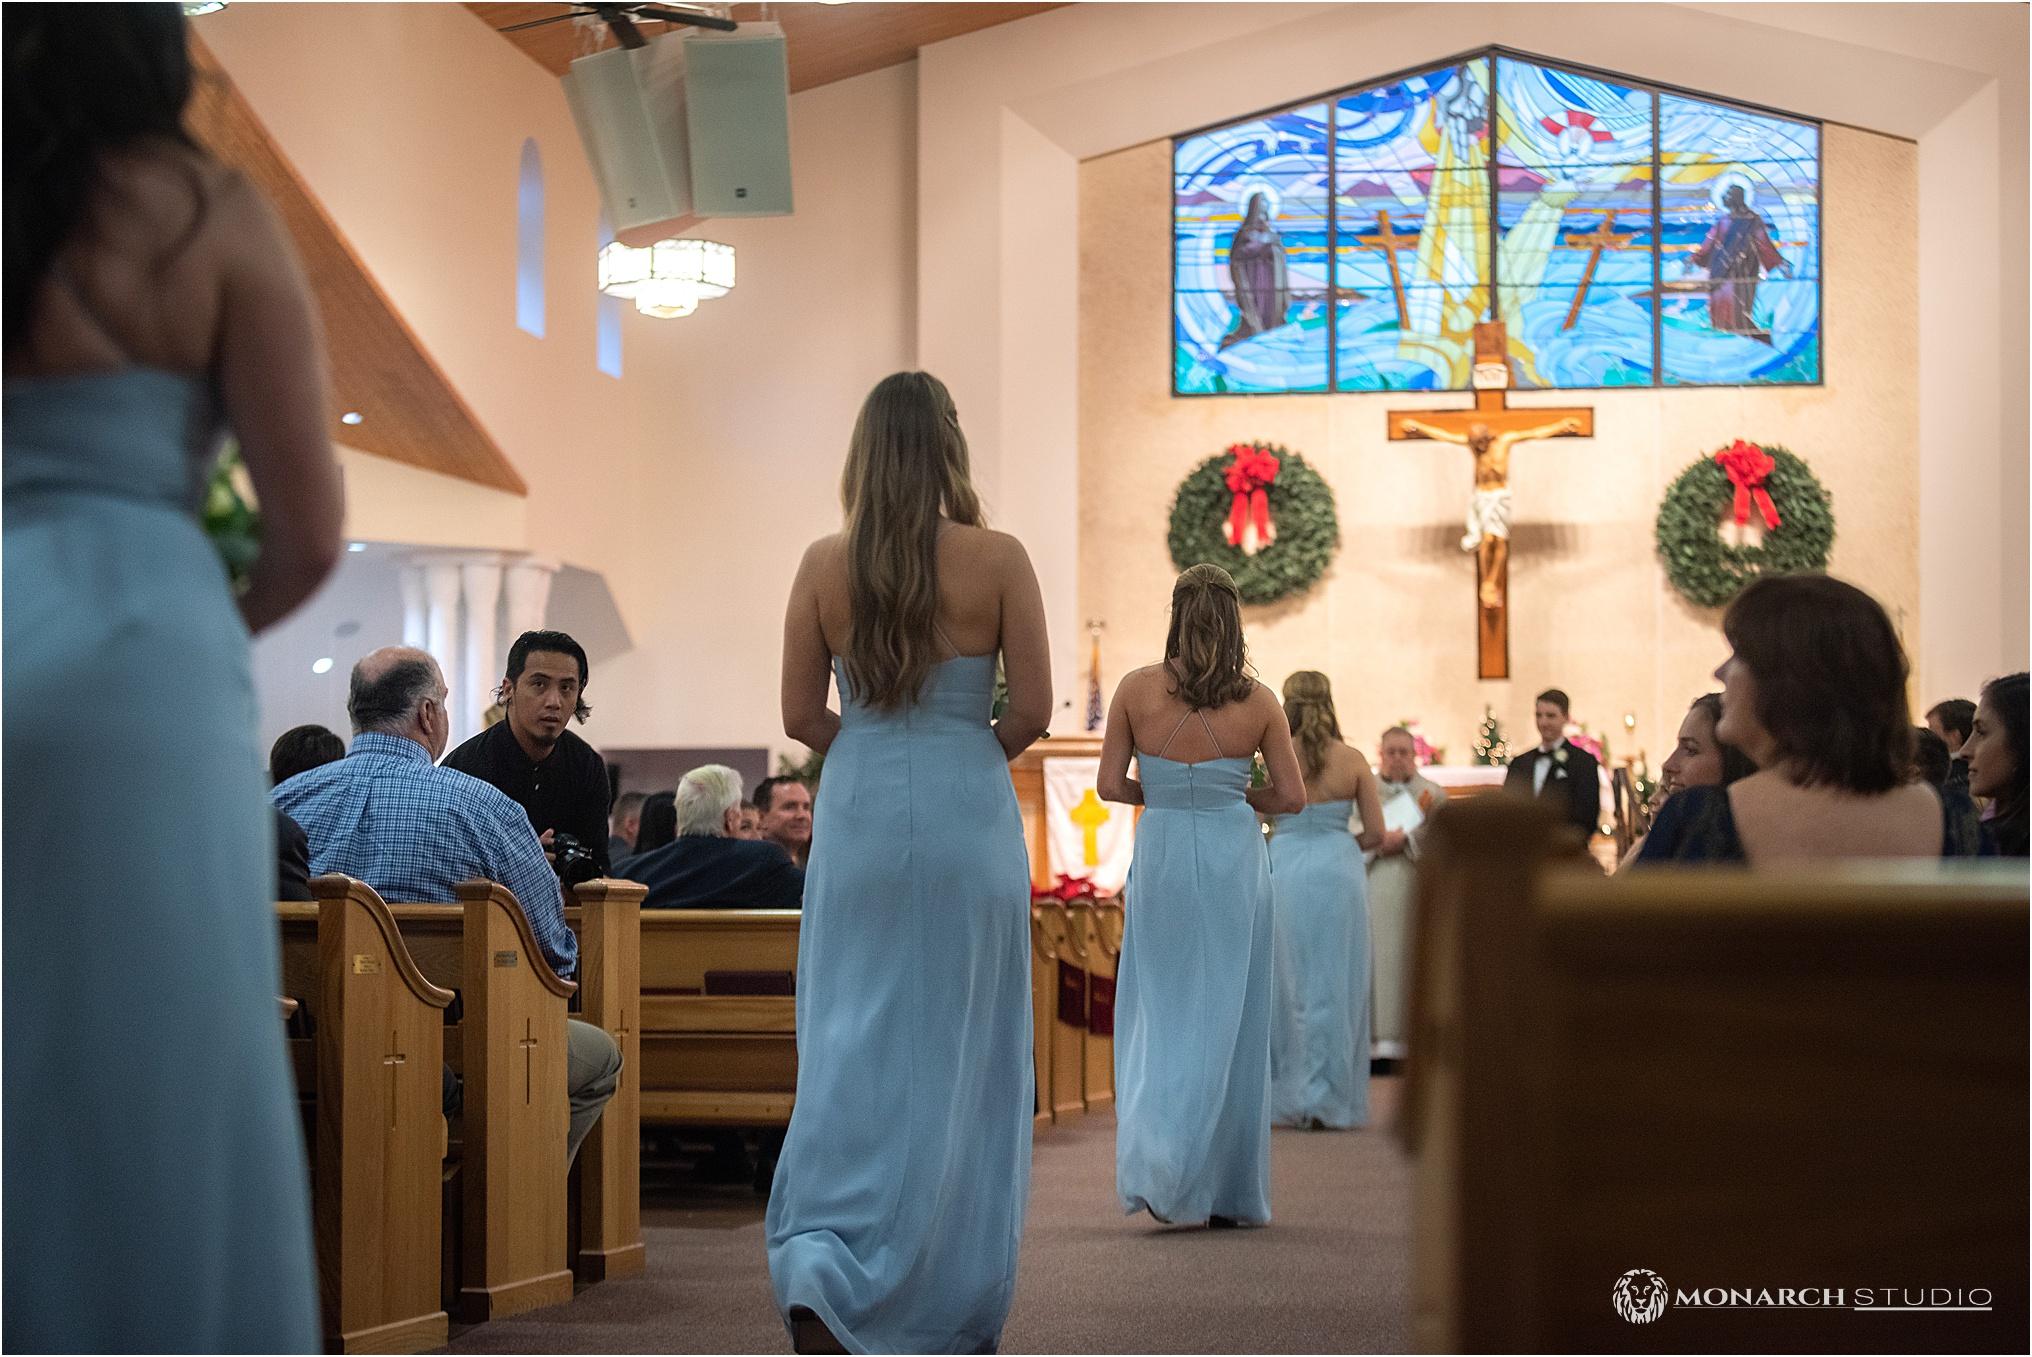 saint-augustine-wedding-photographer-treasury-018.jpg